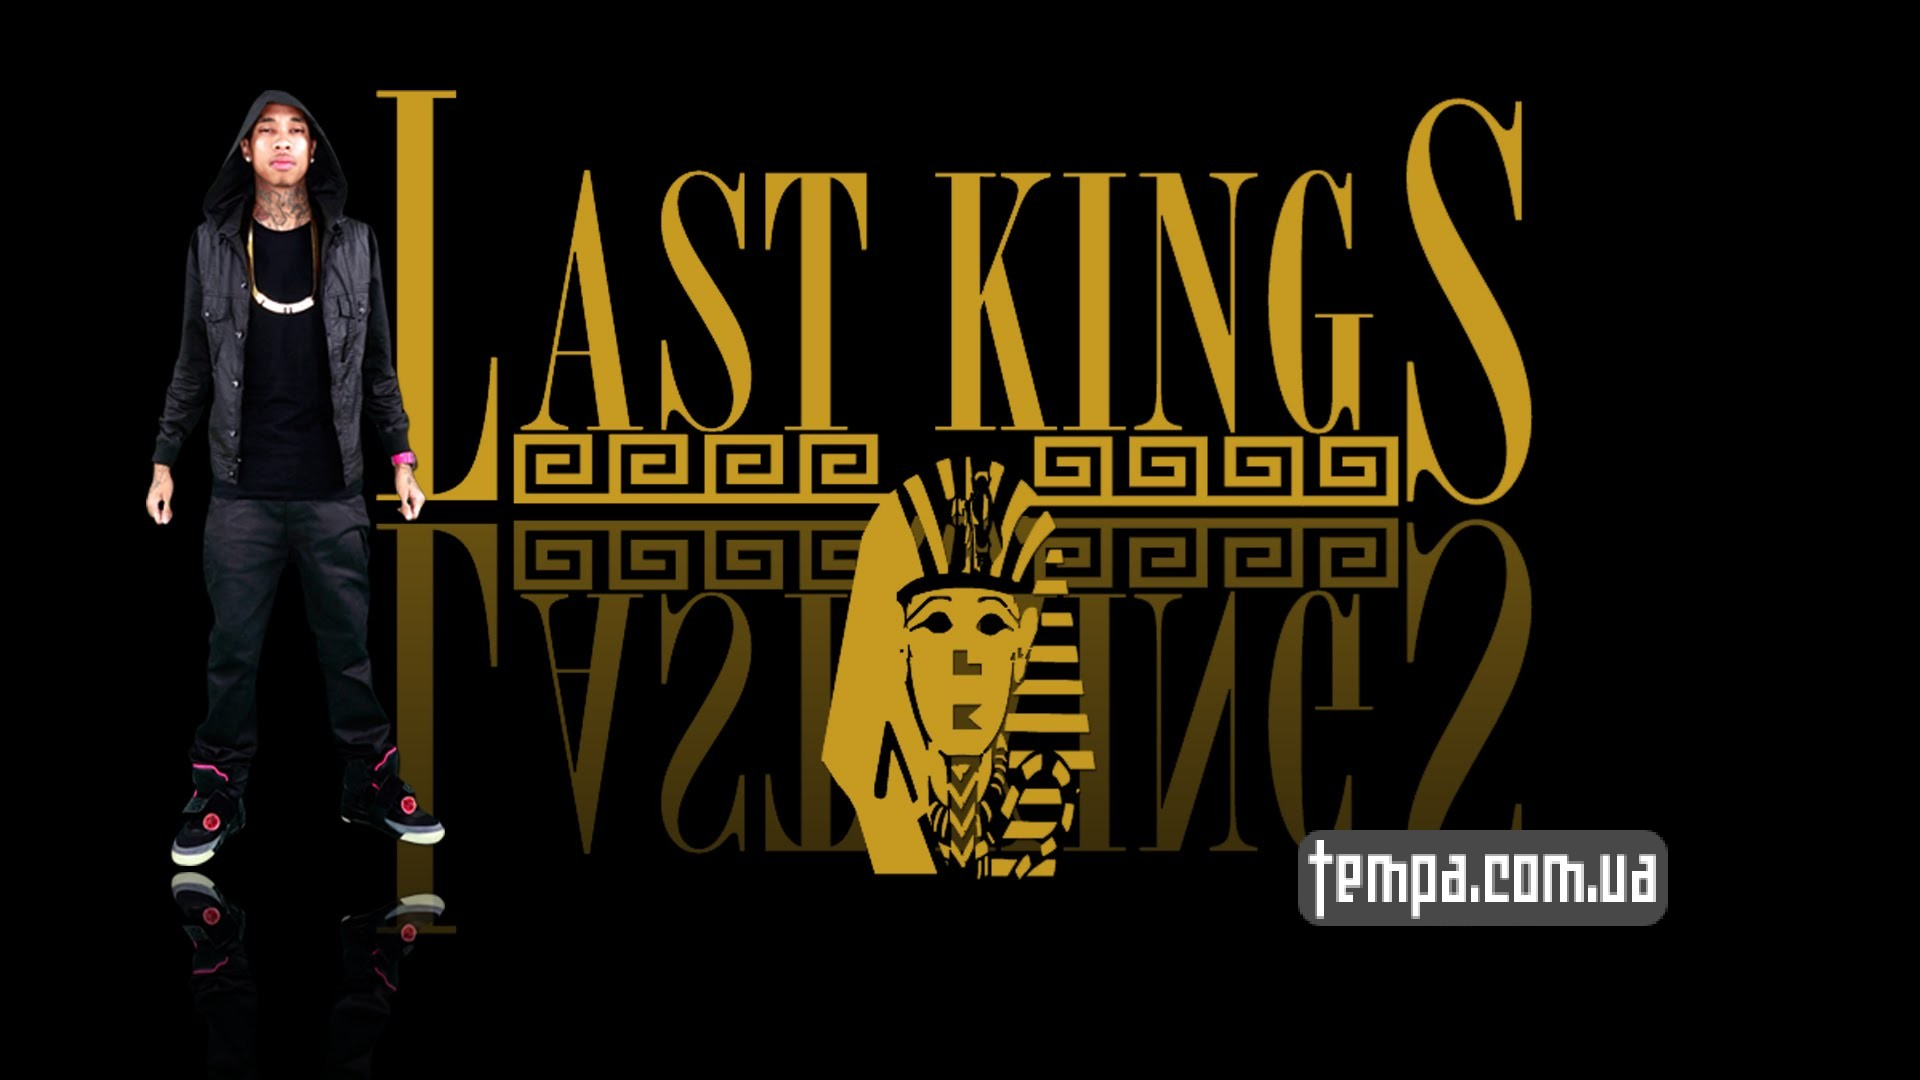 last kings tyga магазин одежда купить украина